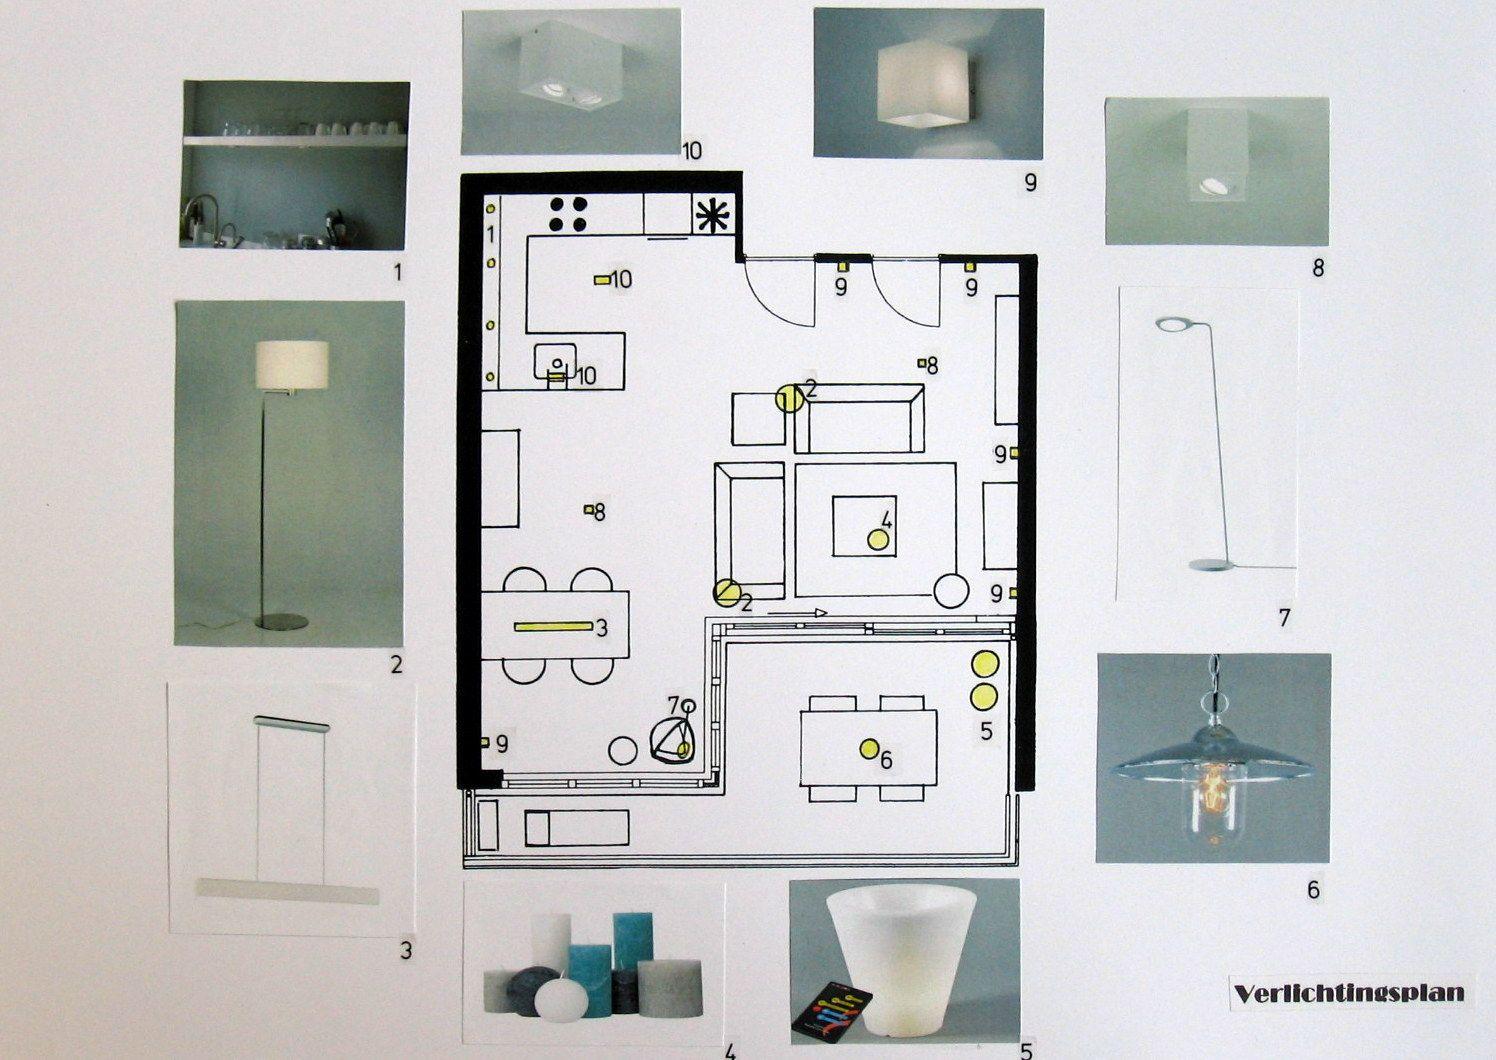 Verlichtingsplan - Concept templates | Pinterest - Interieurstyling ...